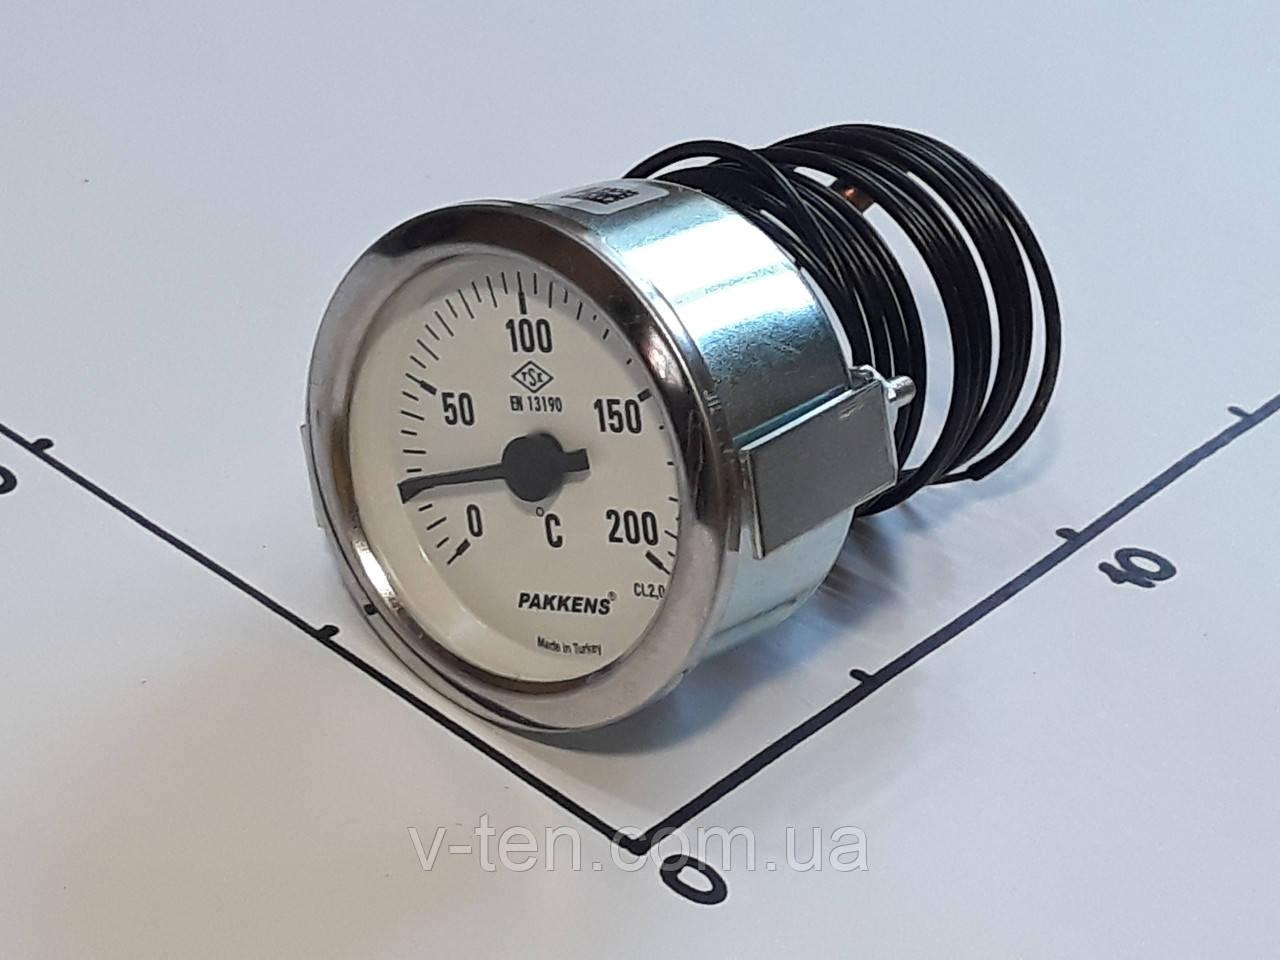 Термометр Ø60мм / 200°С / L-200 cм капиллярный PAKKENS (Турция)